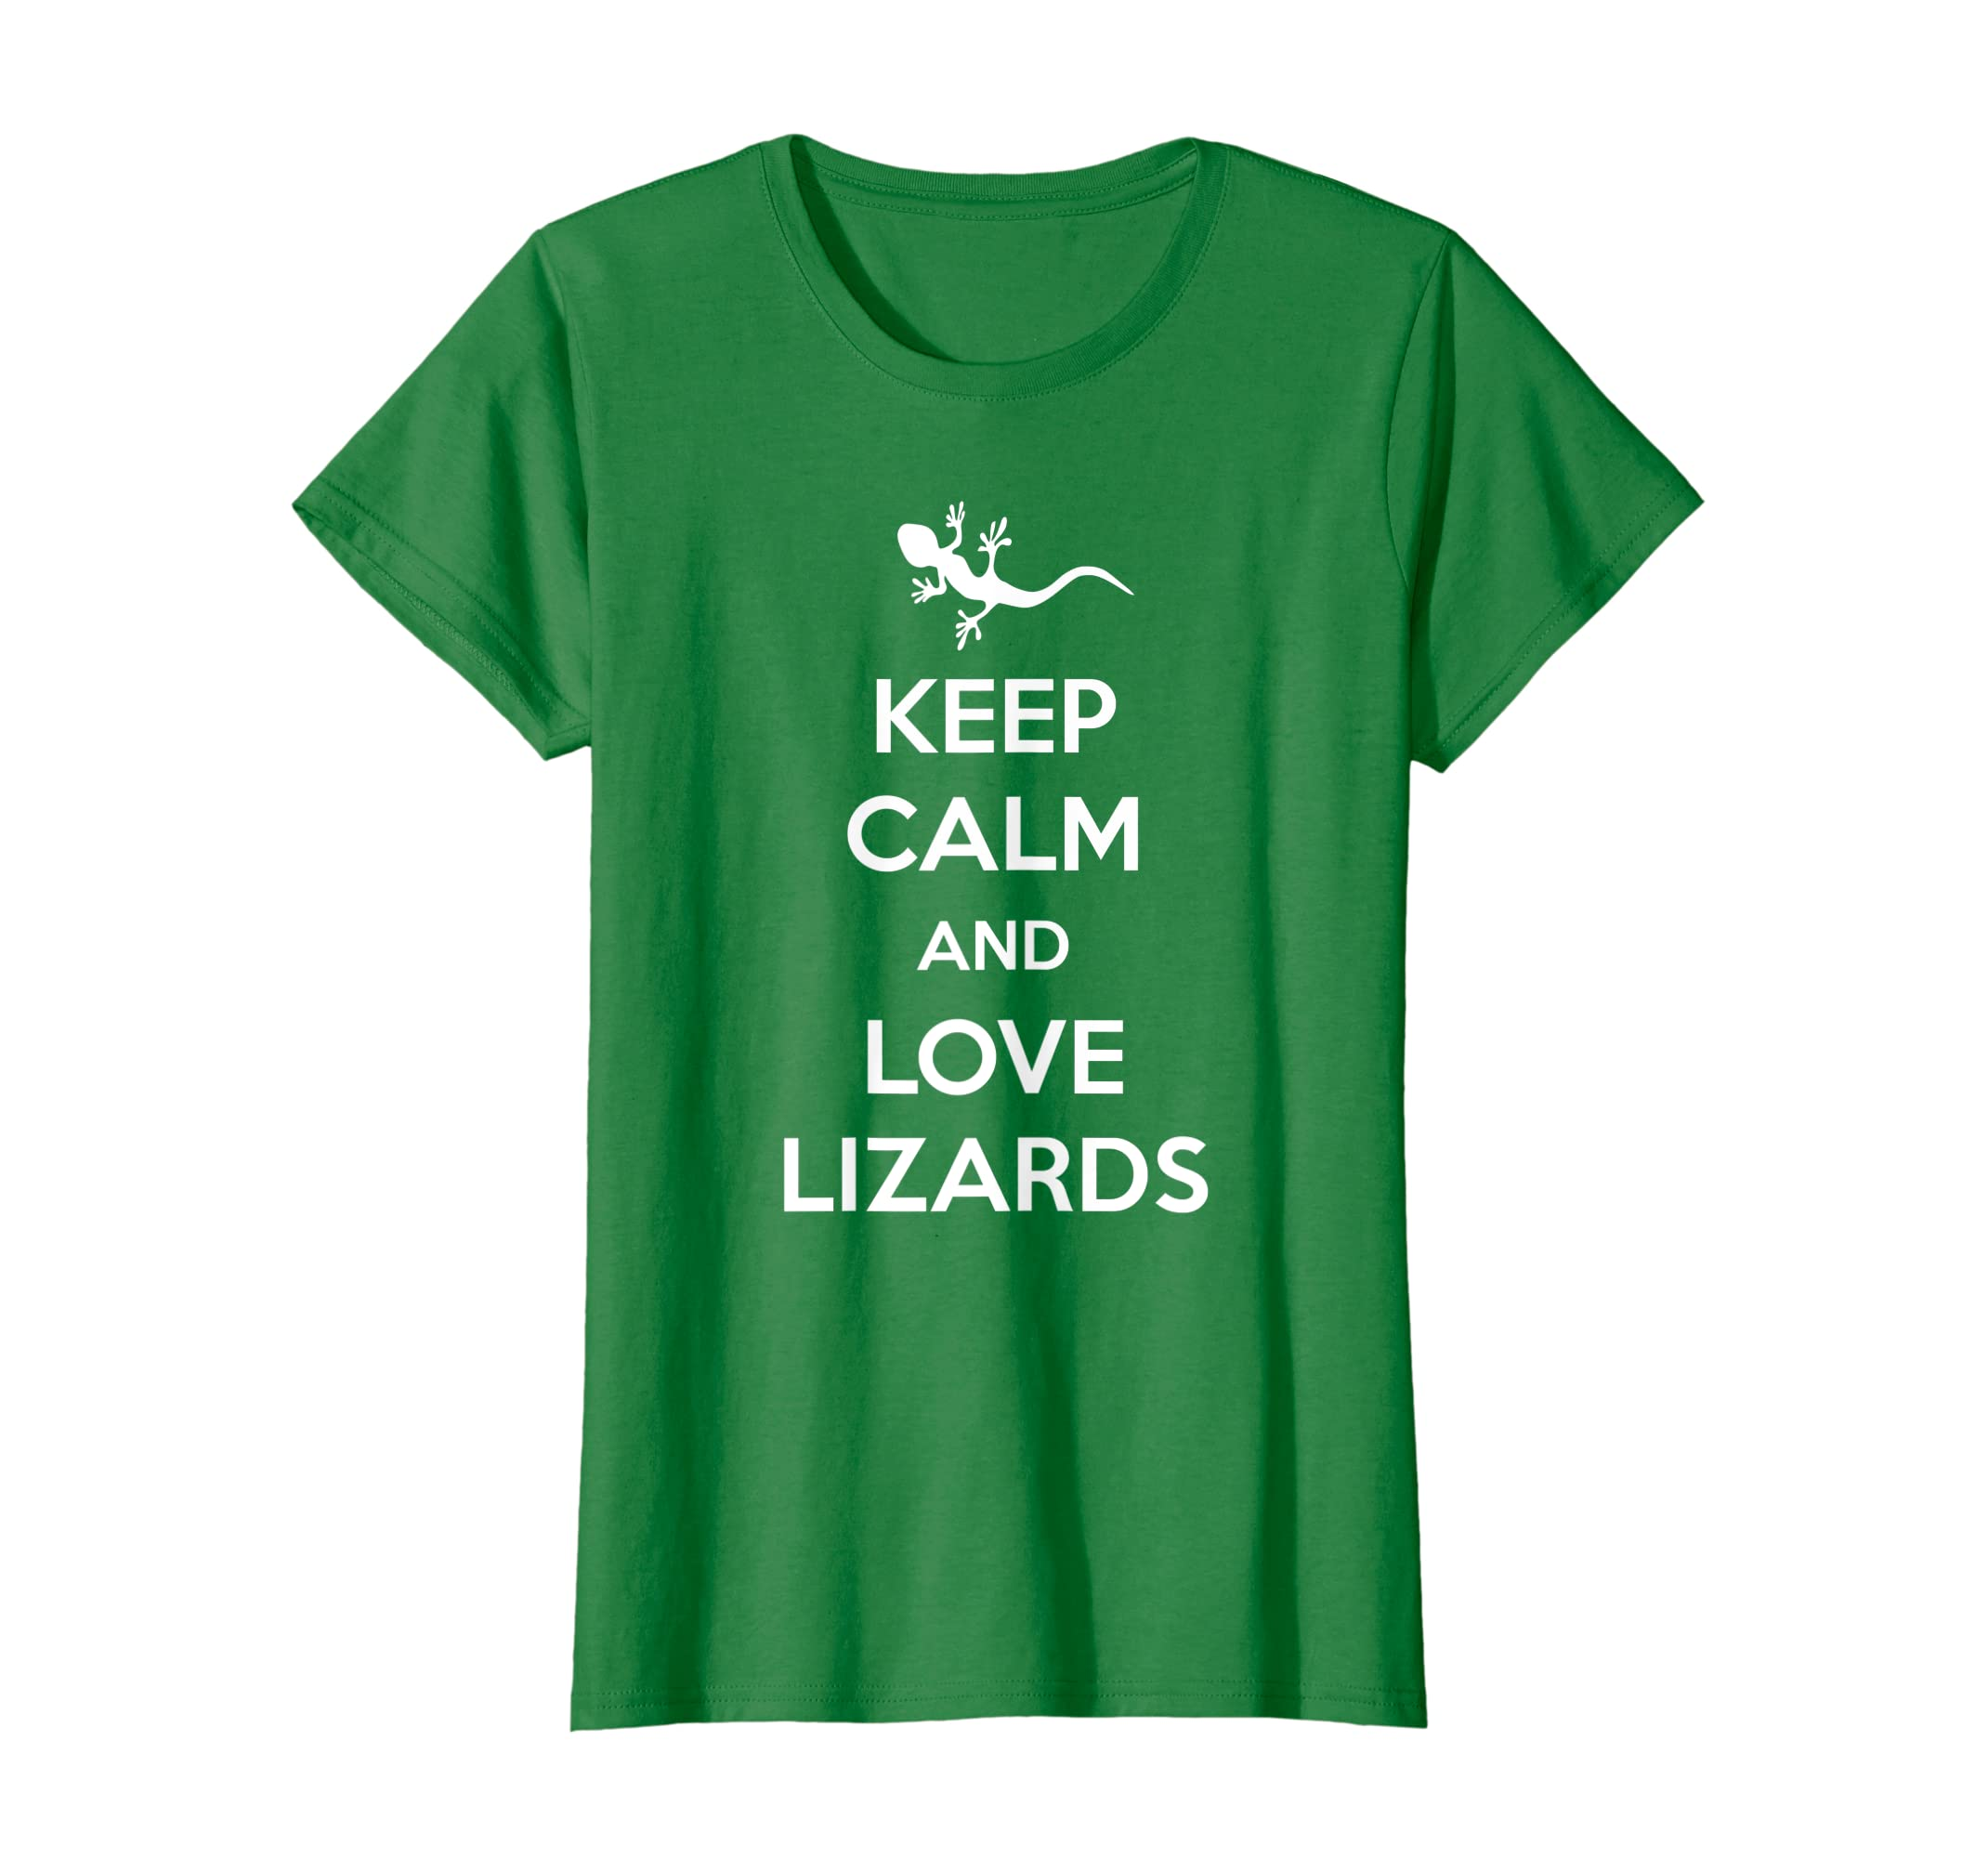 030aa0437 Amazon.com: Funny Lizard Shirt   Keep Calm and Love Lizards T-Shirt:  Clothing